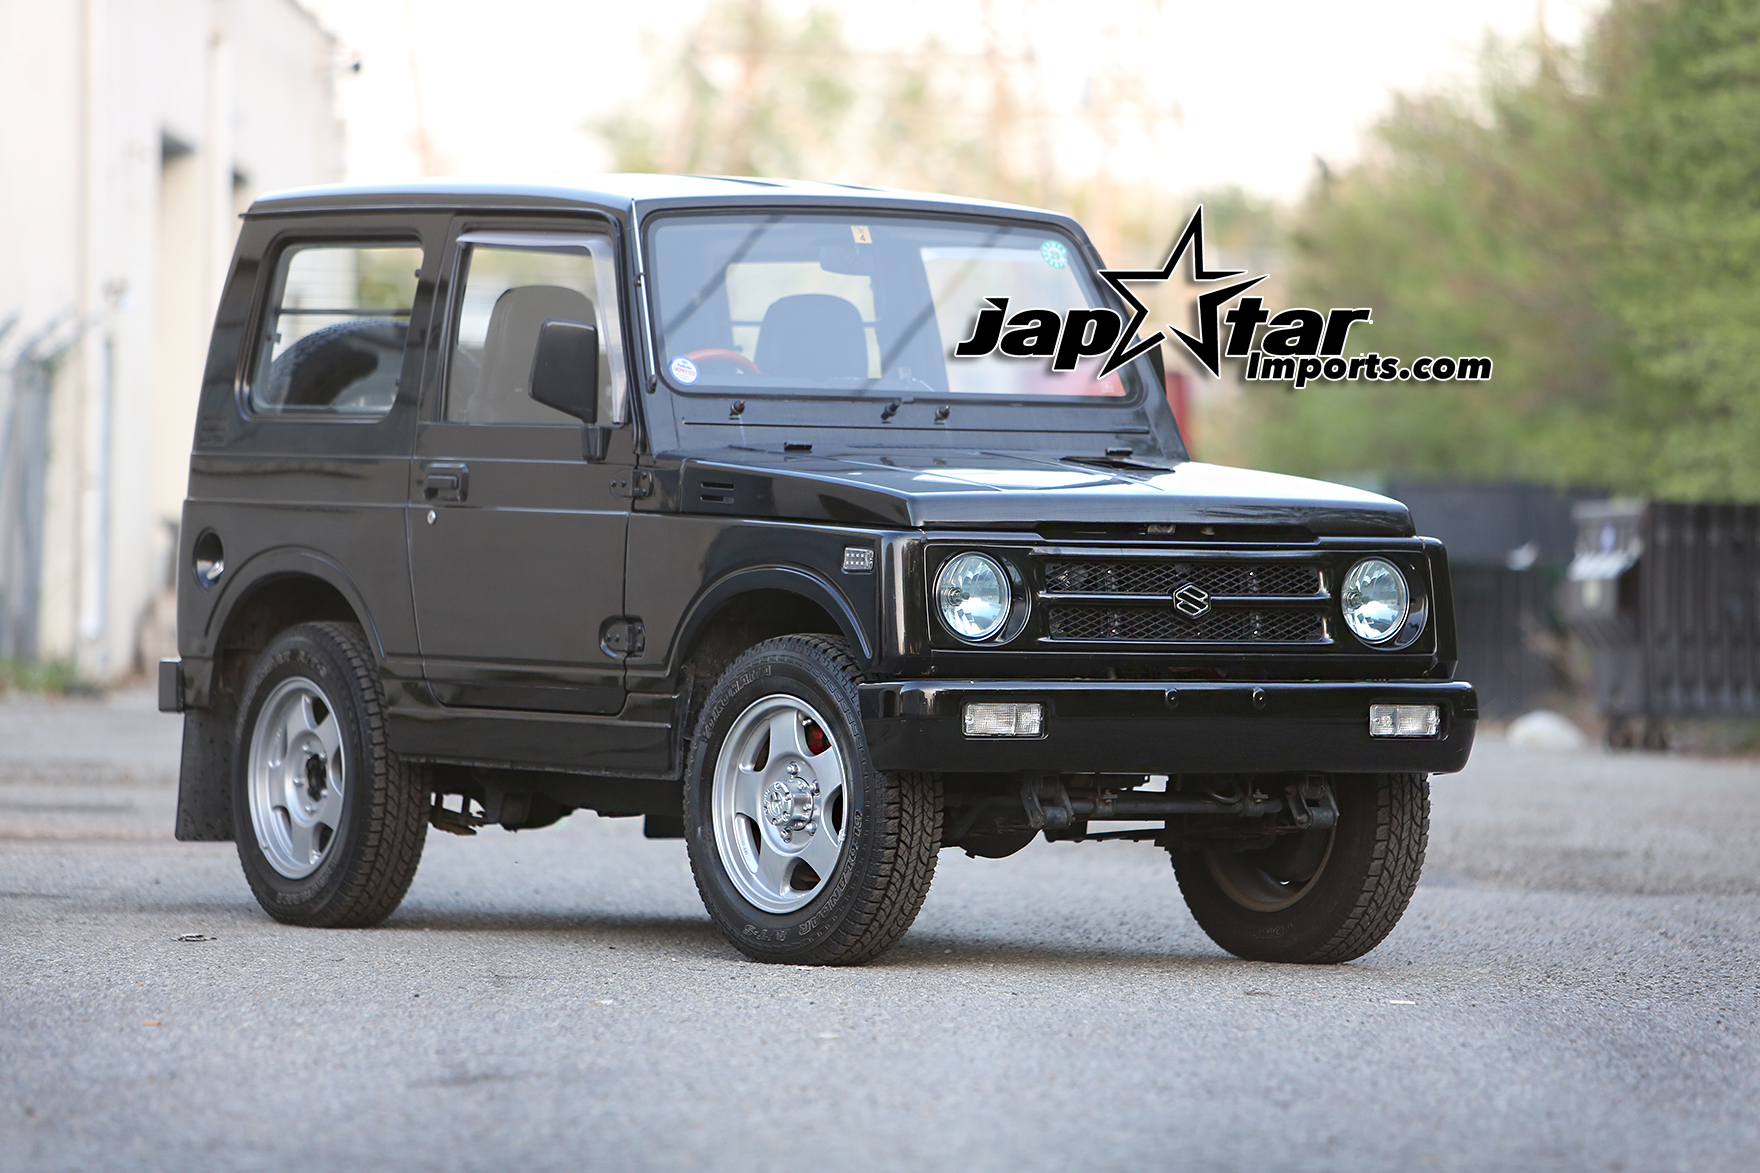 1992 Suzuki Jimny - SOLD